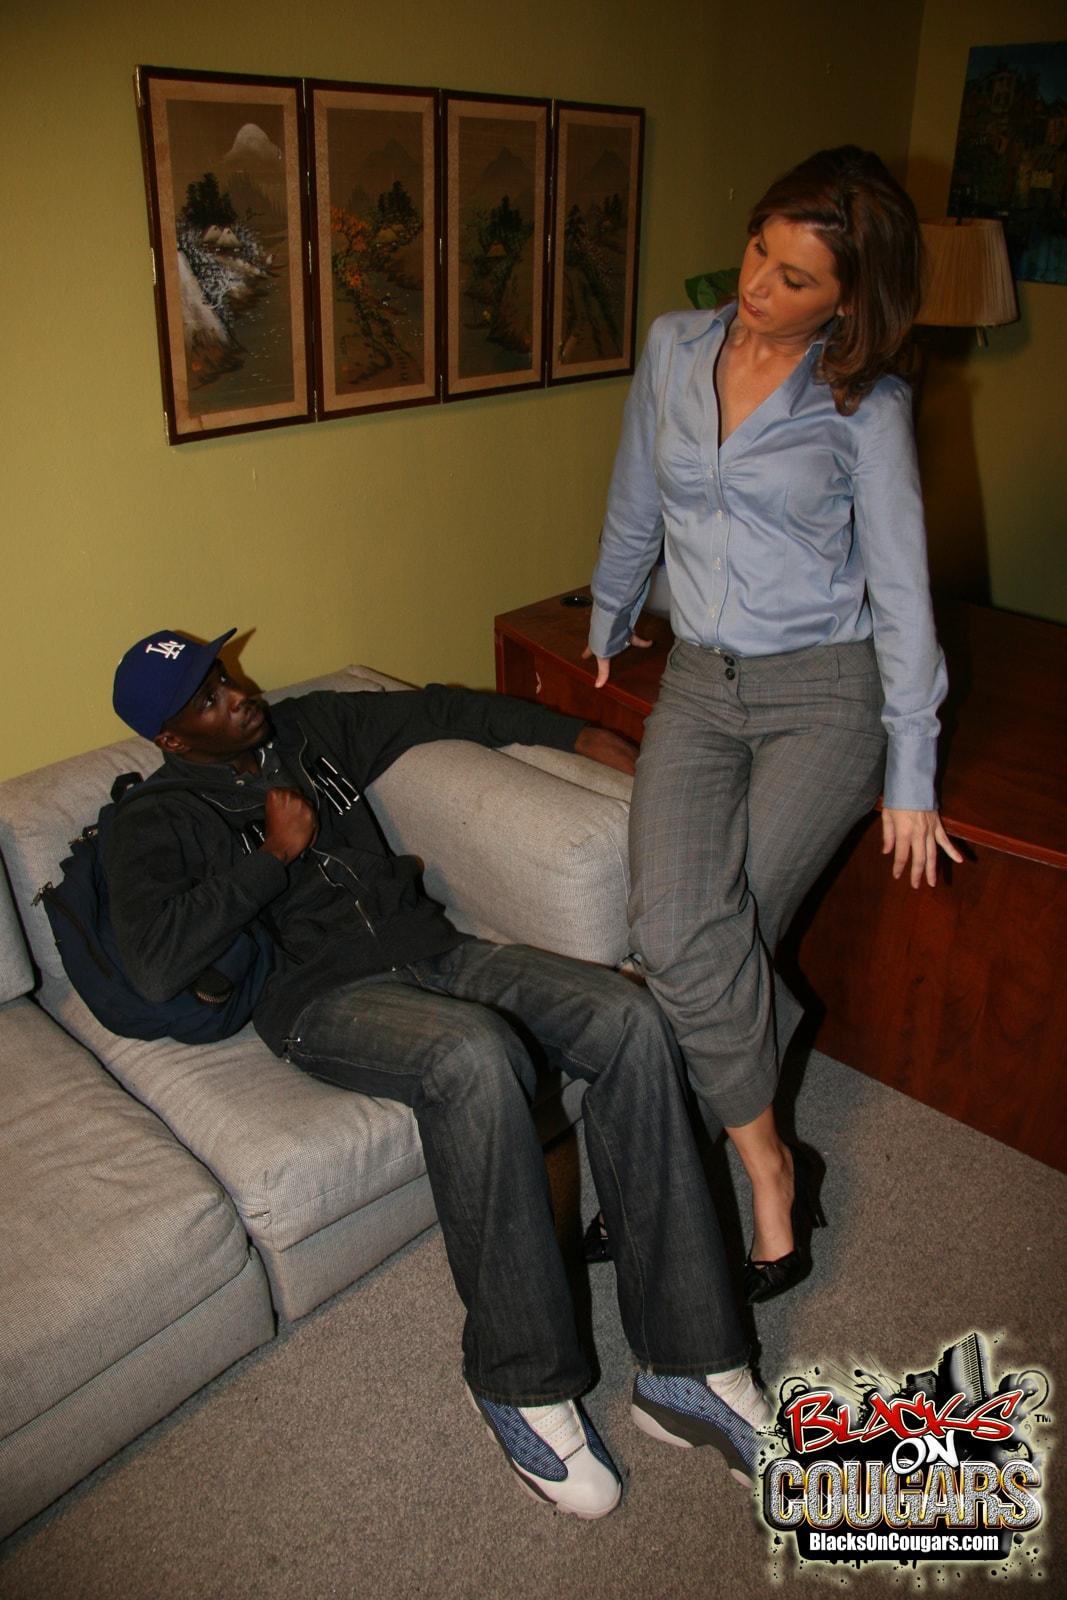 Dogfart '- Blacks On Cougars' starring Rae Rogers (Photo 5)